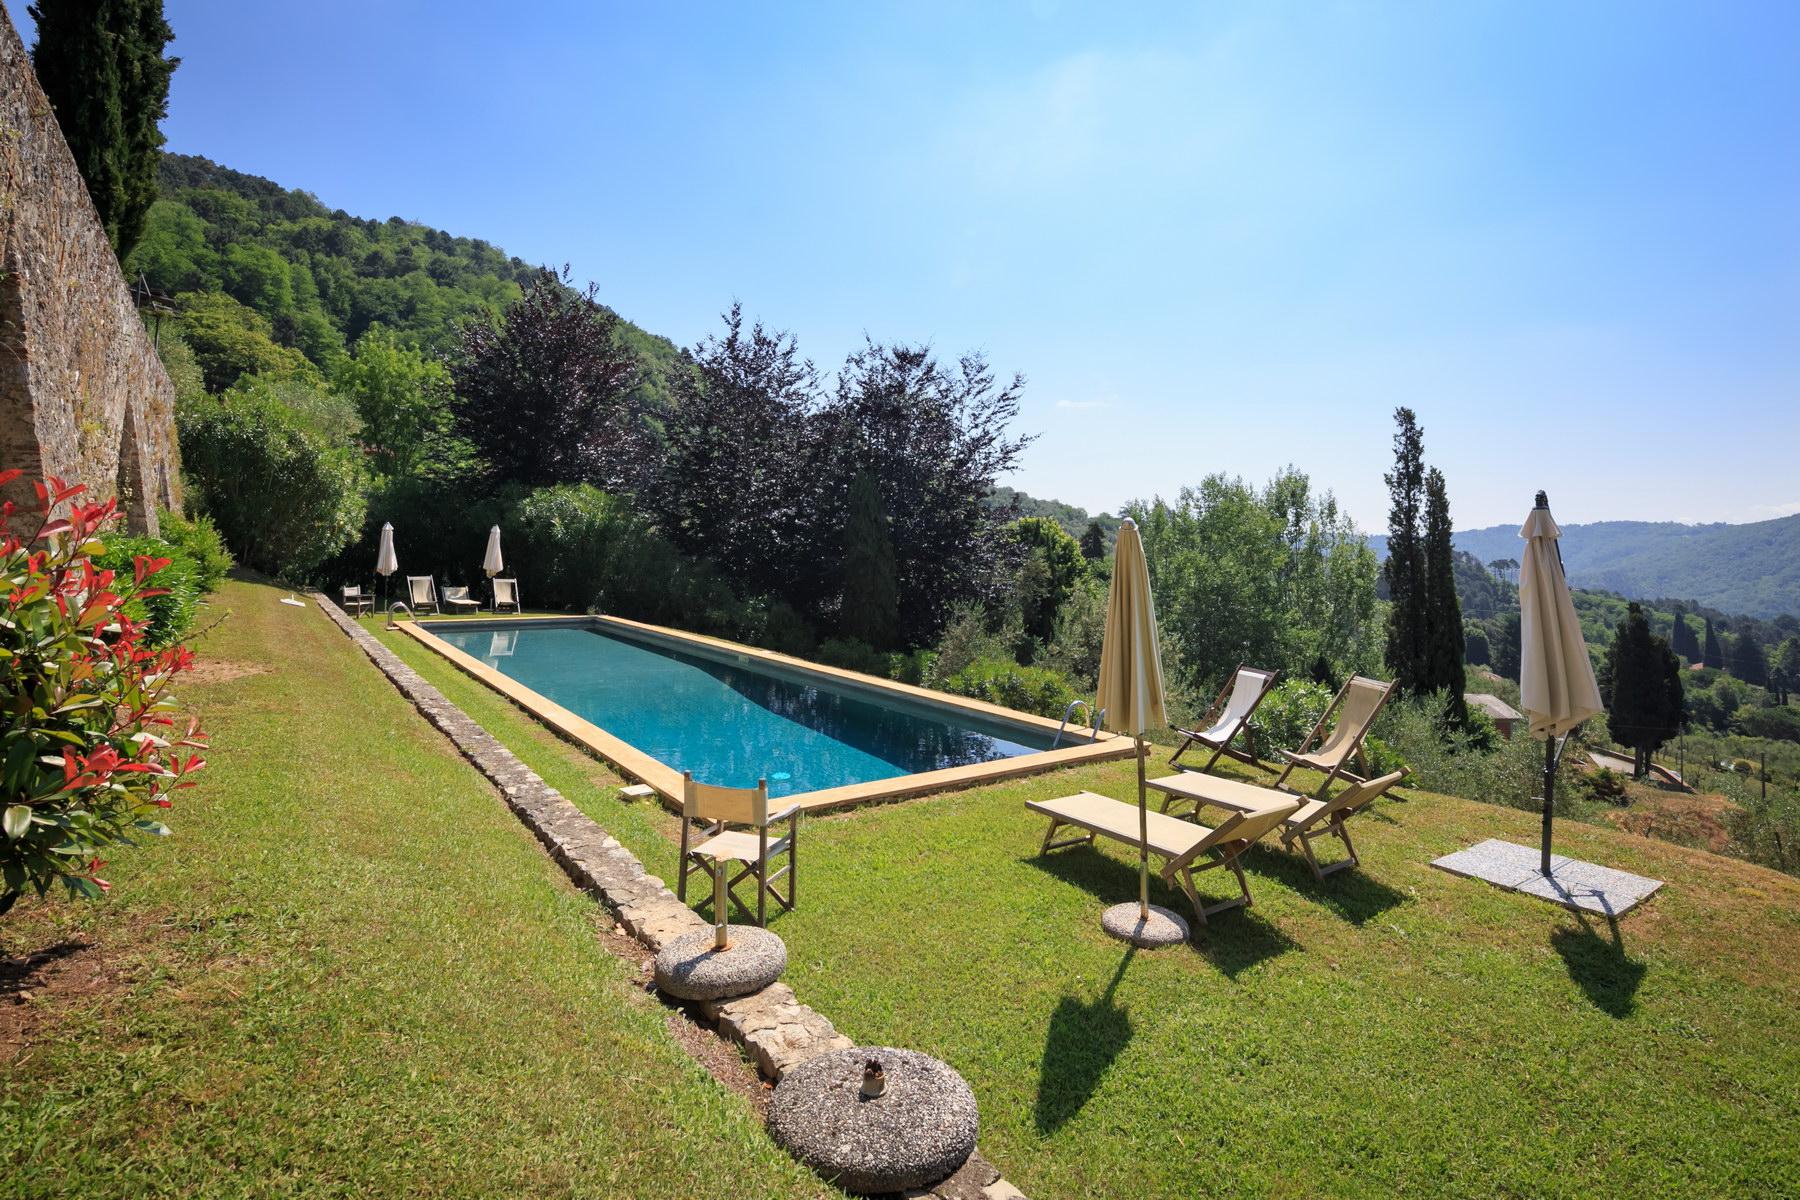 Villa in Vendita a Lucca: 5 locali, 1500 mq - Foto 4